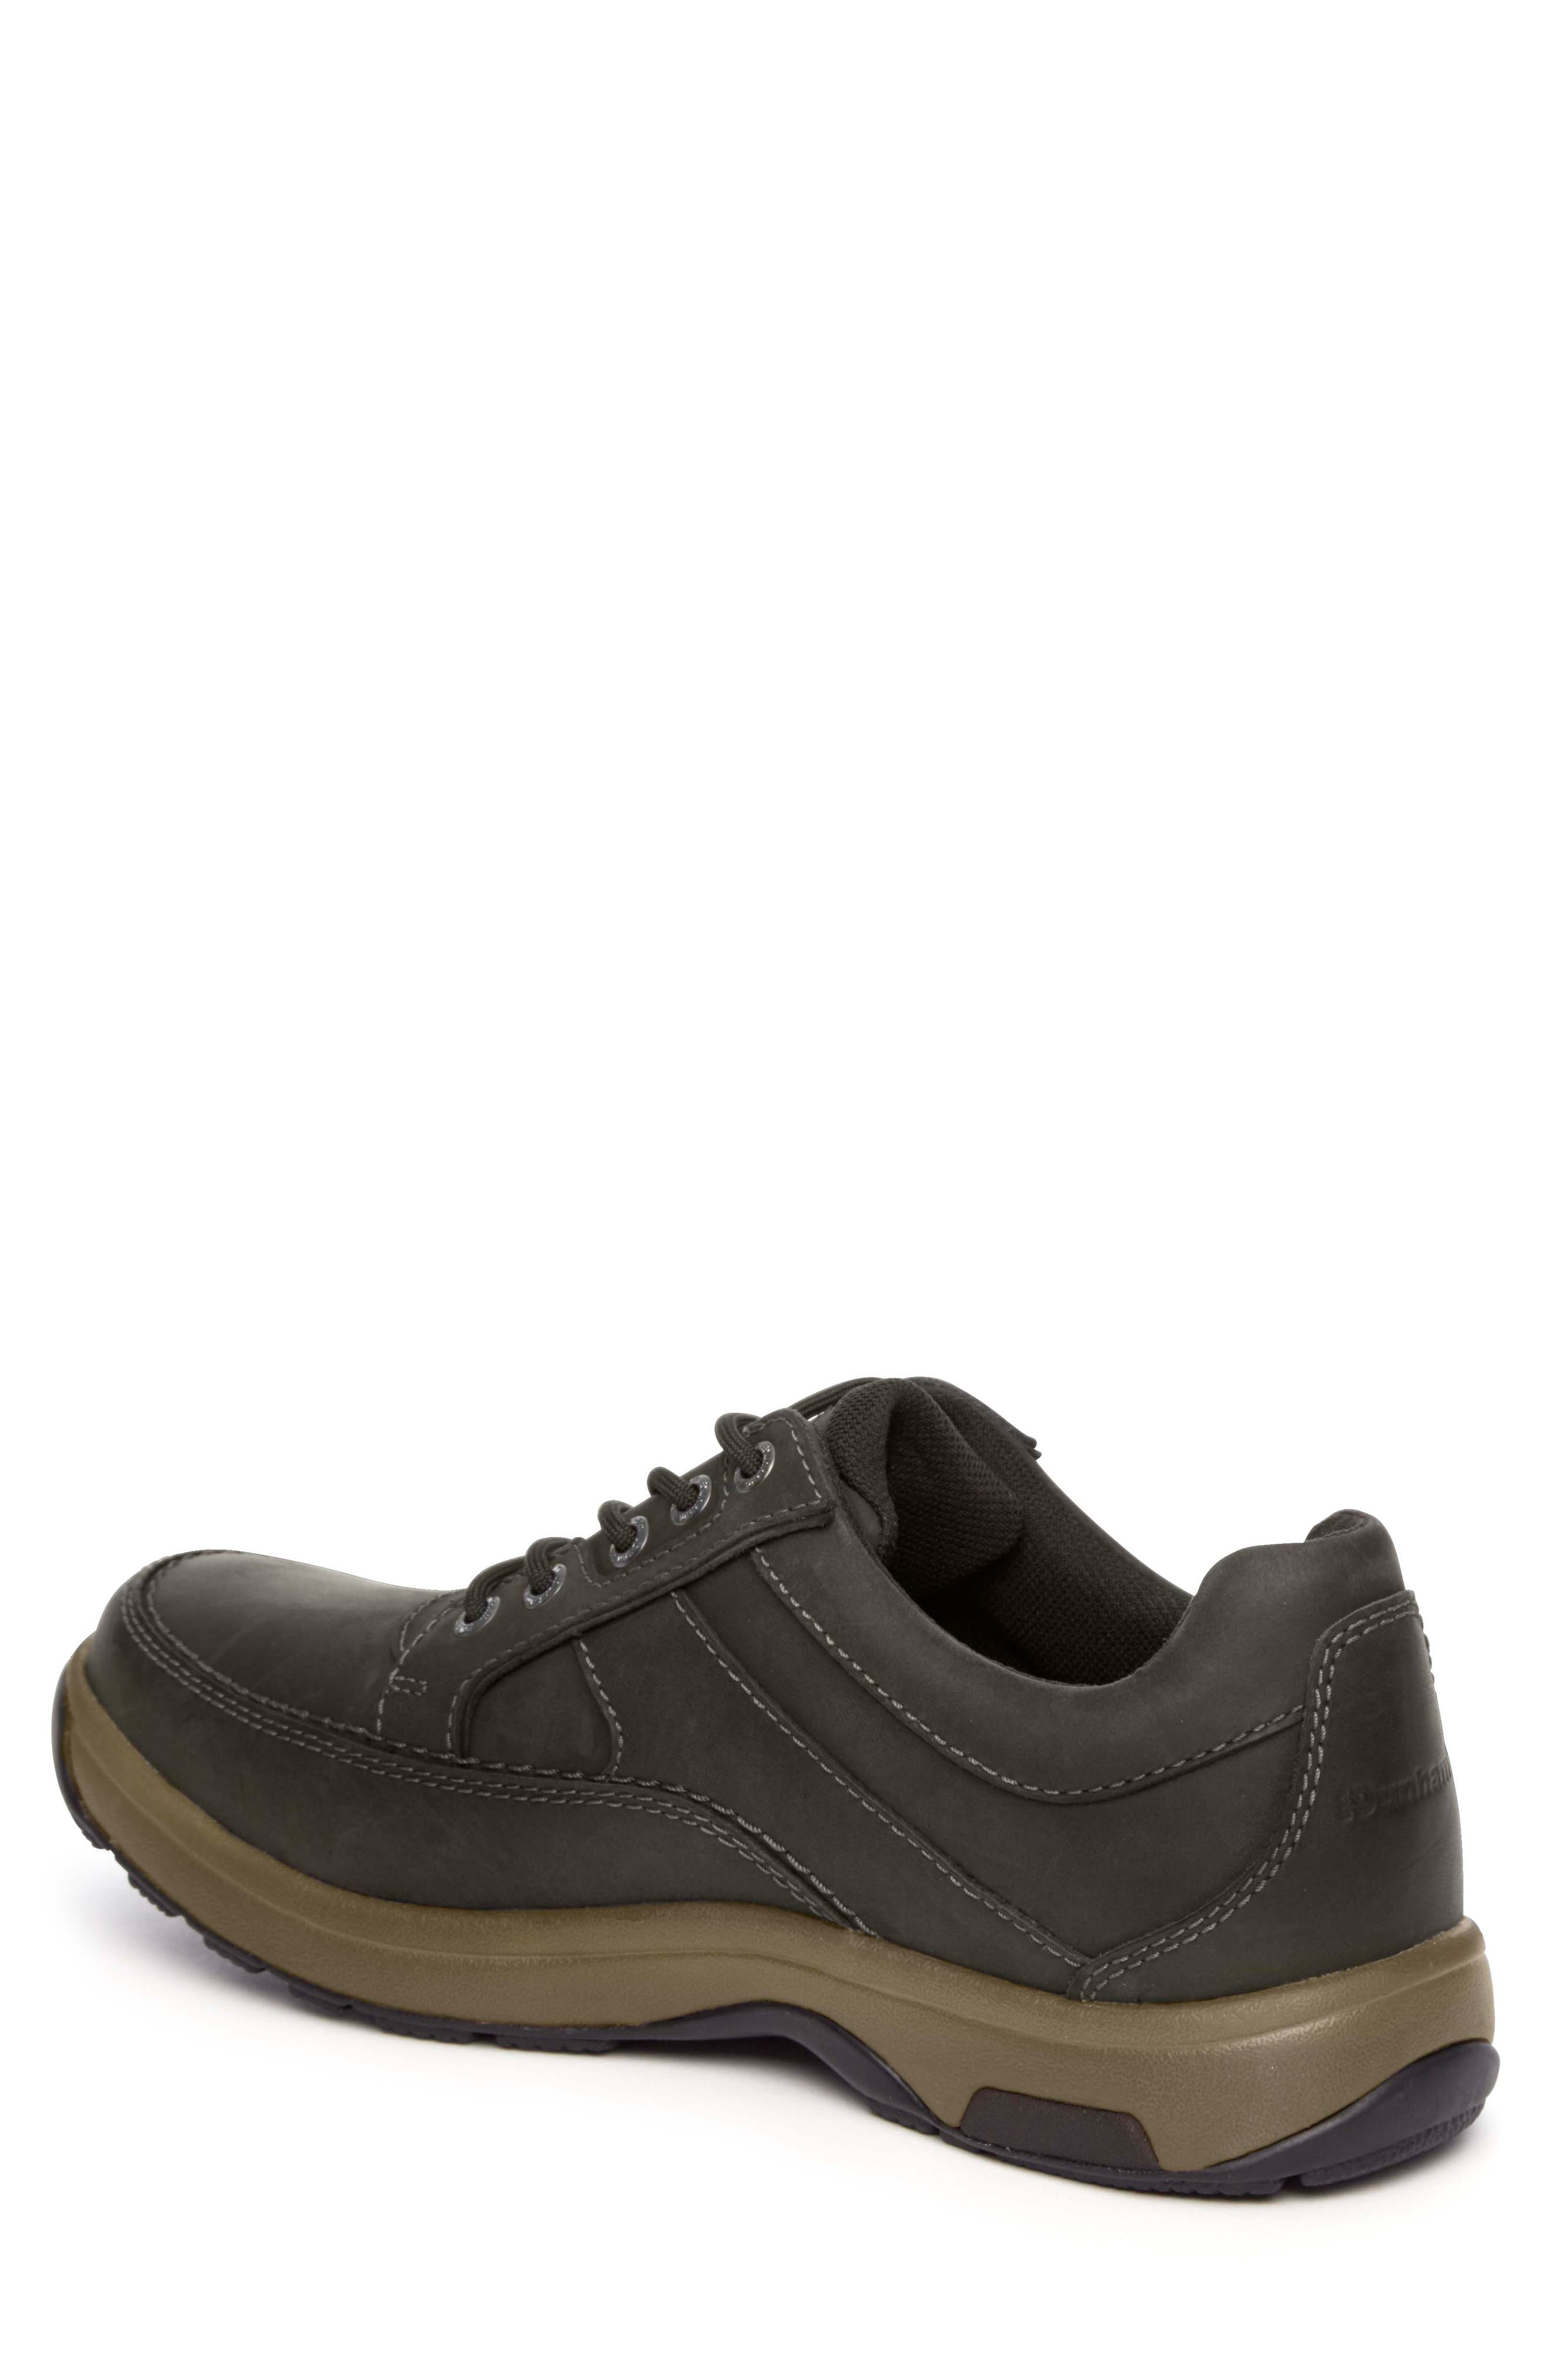 DUNHAM, 'Midland' Sneaker, Alternate thumbnail 2, color, BROWN LEATHER